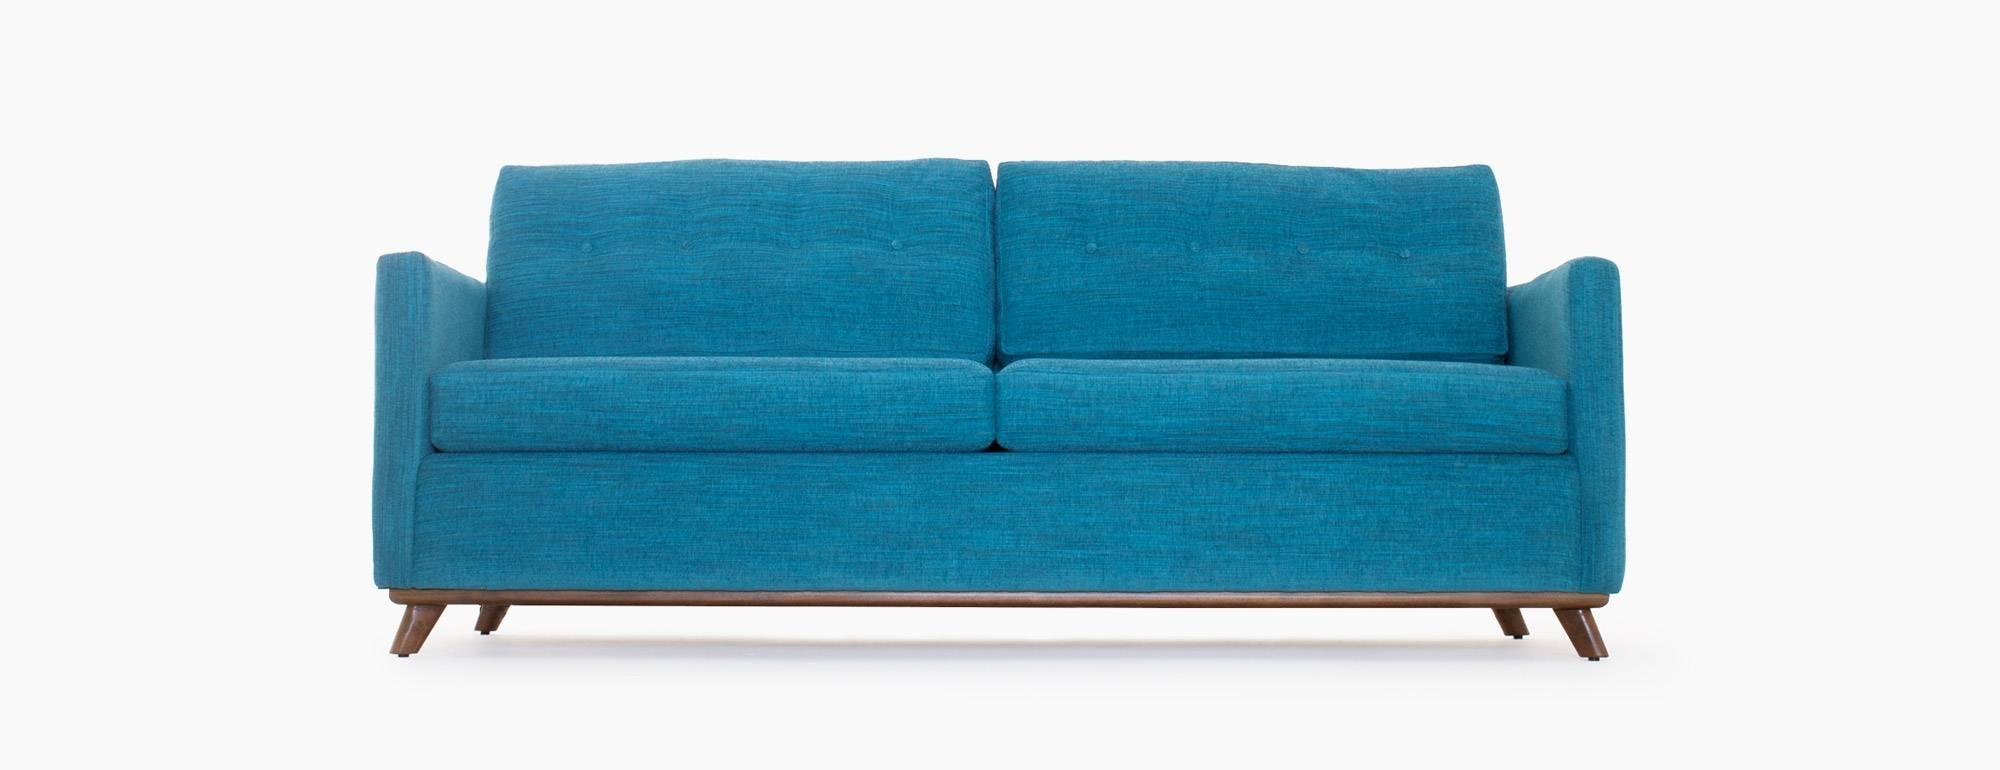 aqua sofa couch vs the best beds